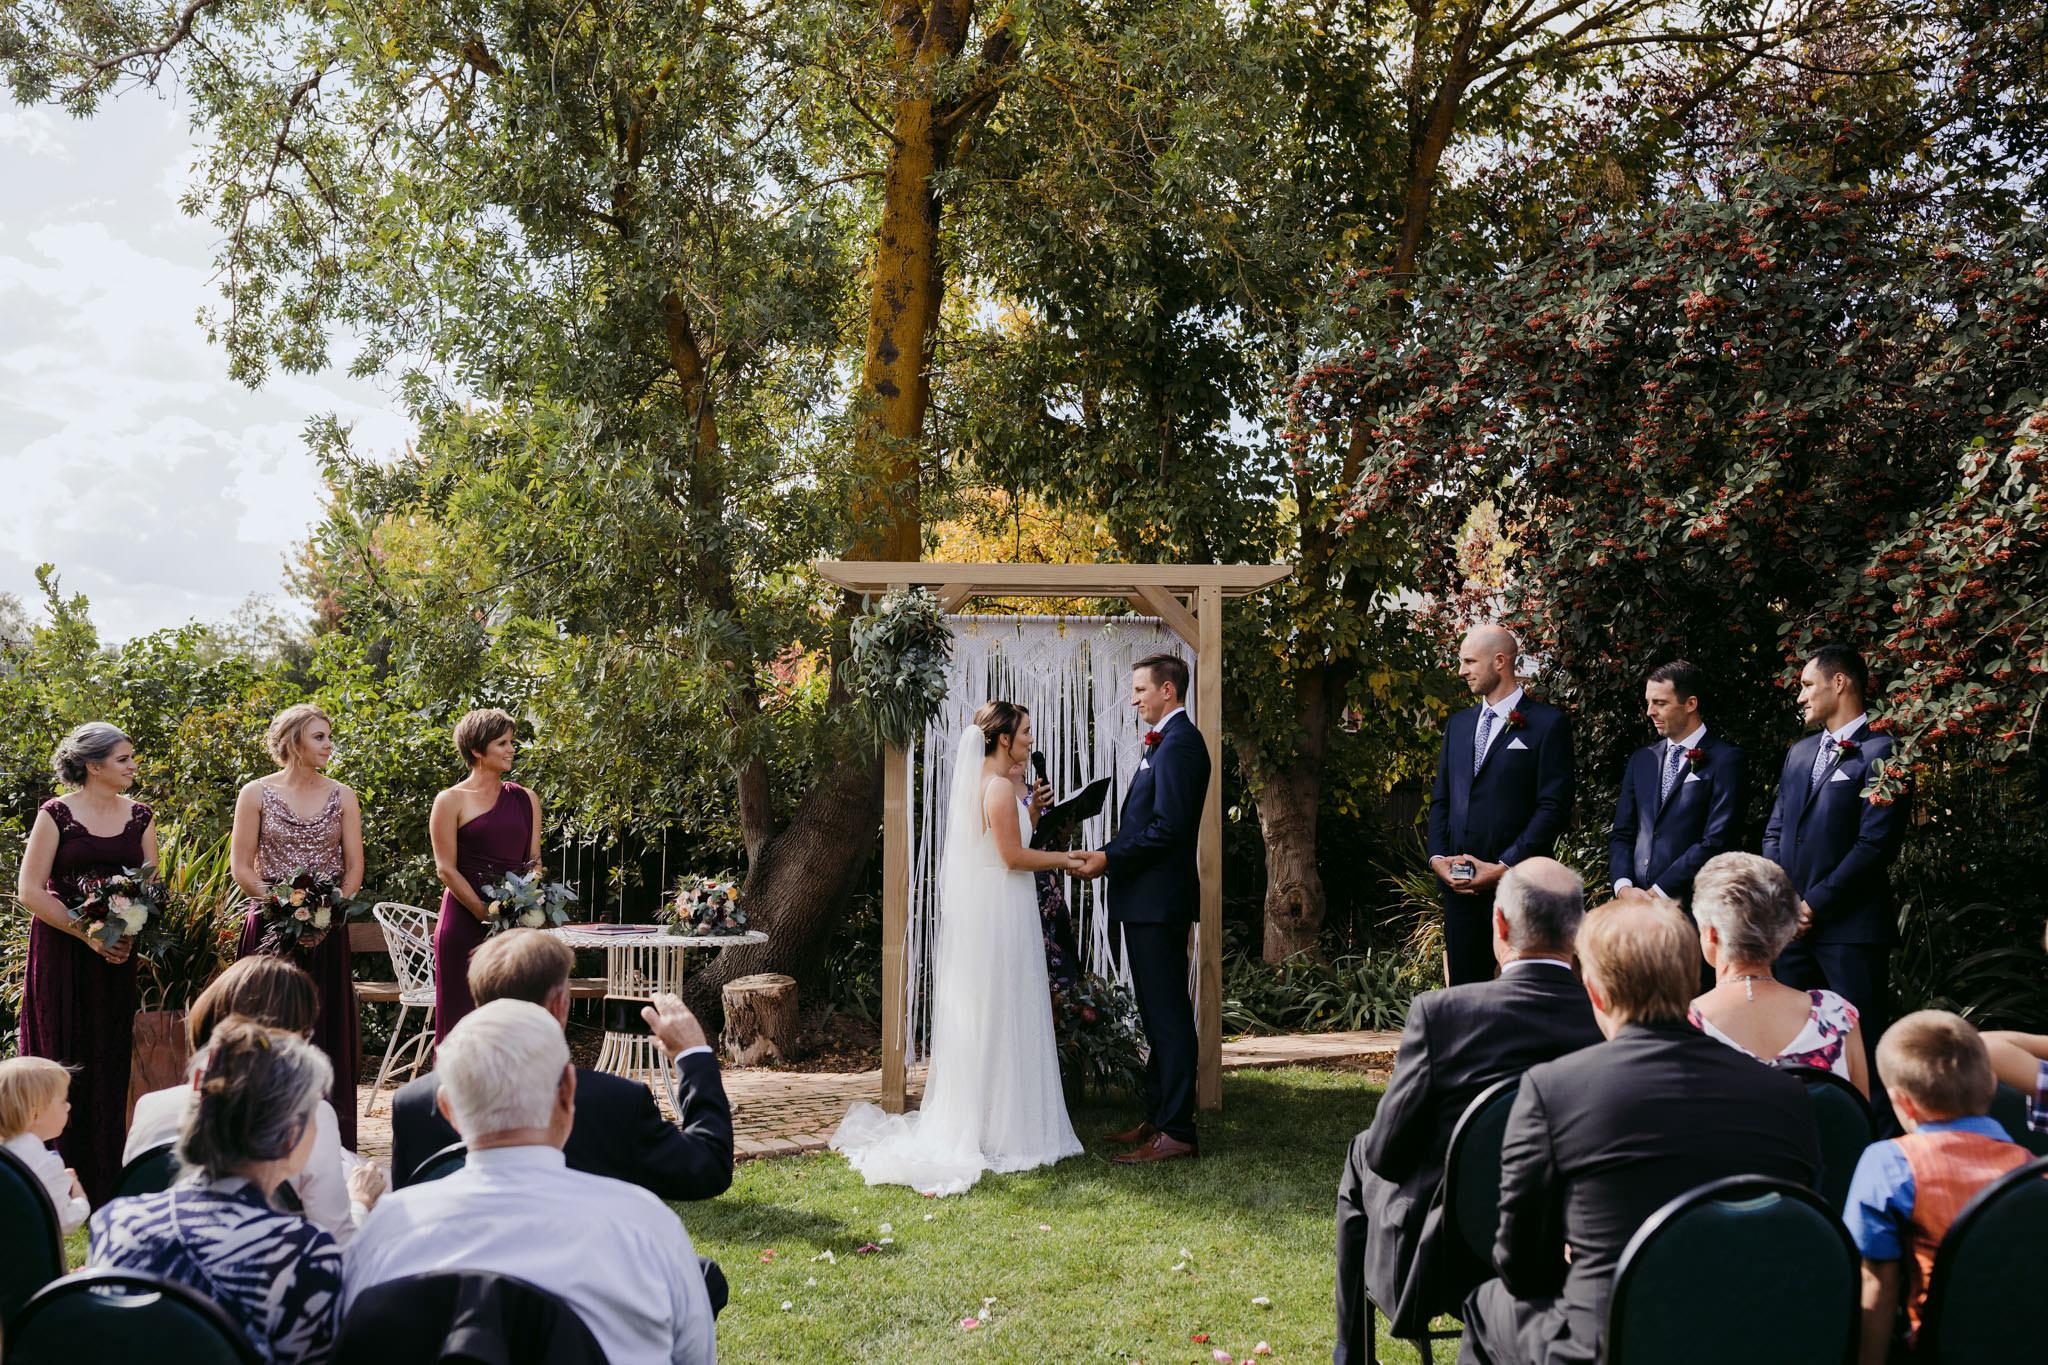 Erin Latimore Mudgee Canberra Wedding Photographer ROSEBANK GUESTHOUSE OLD THEATRE TONIC MILLTHORPE_249.JPG